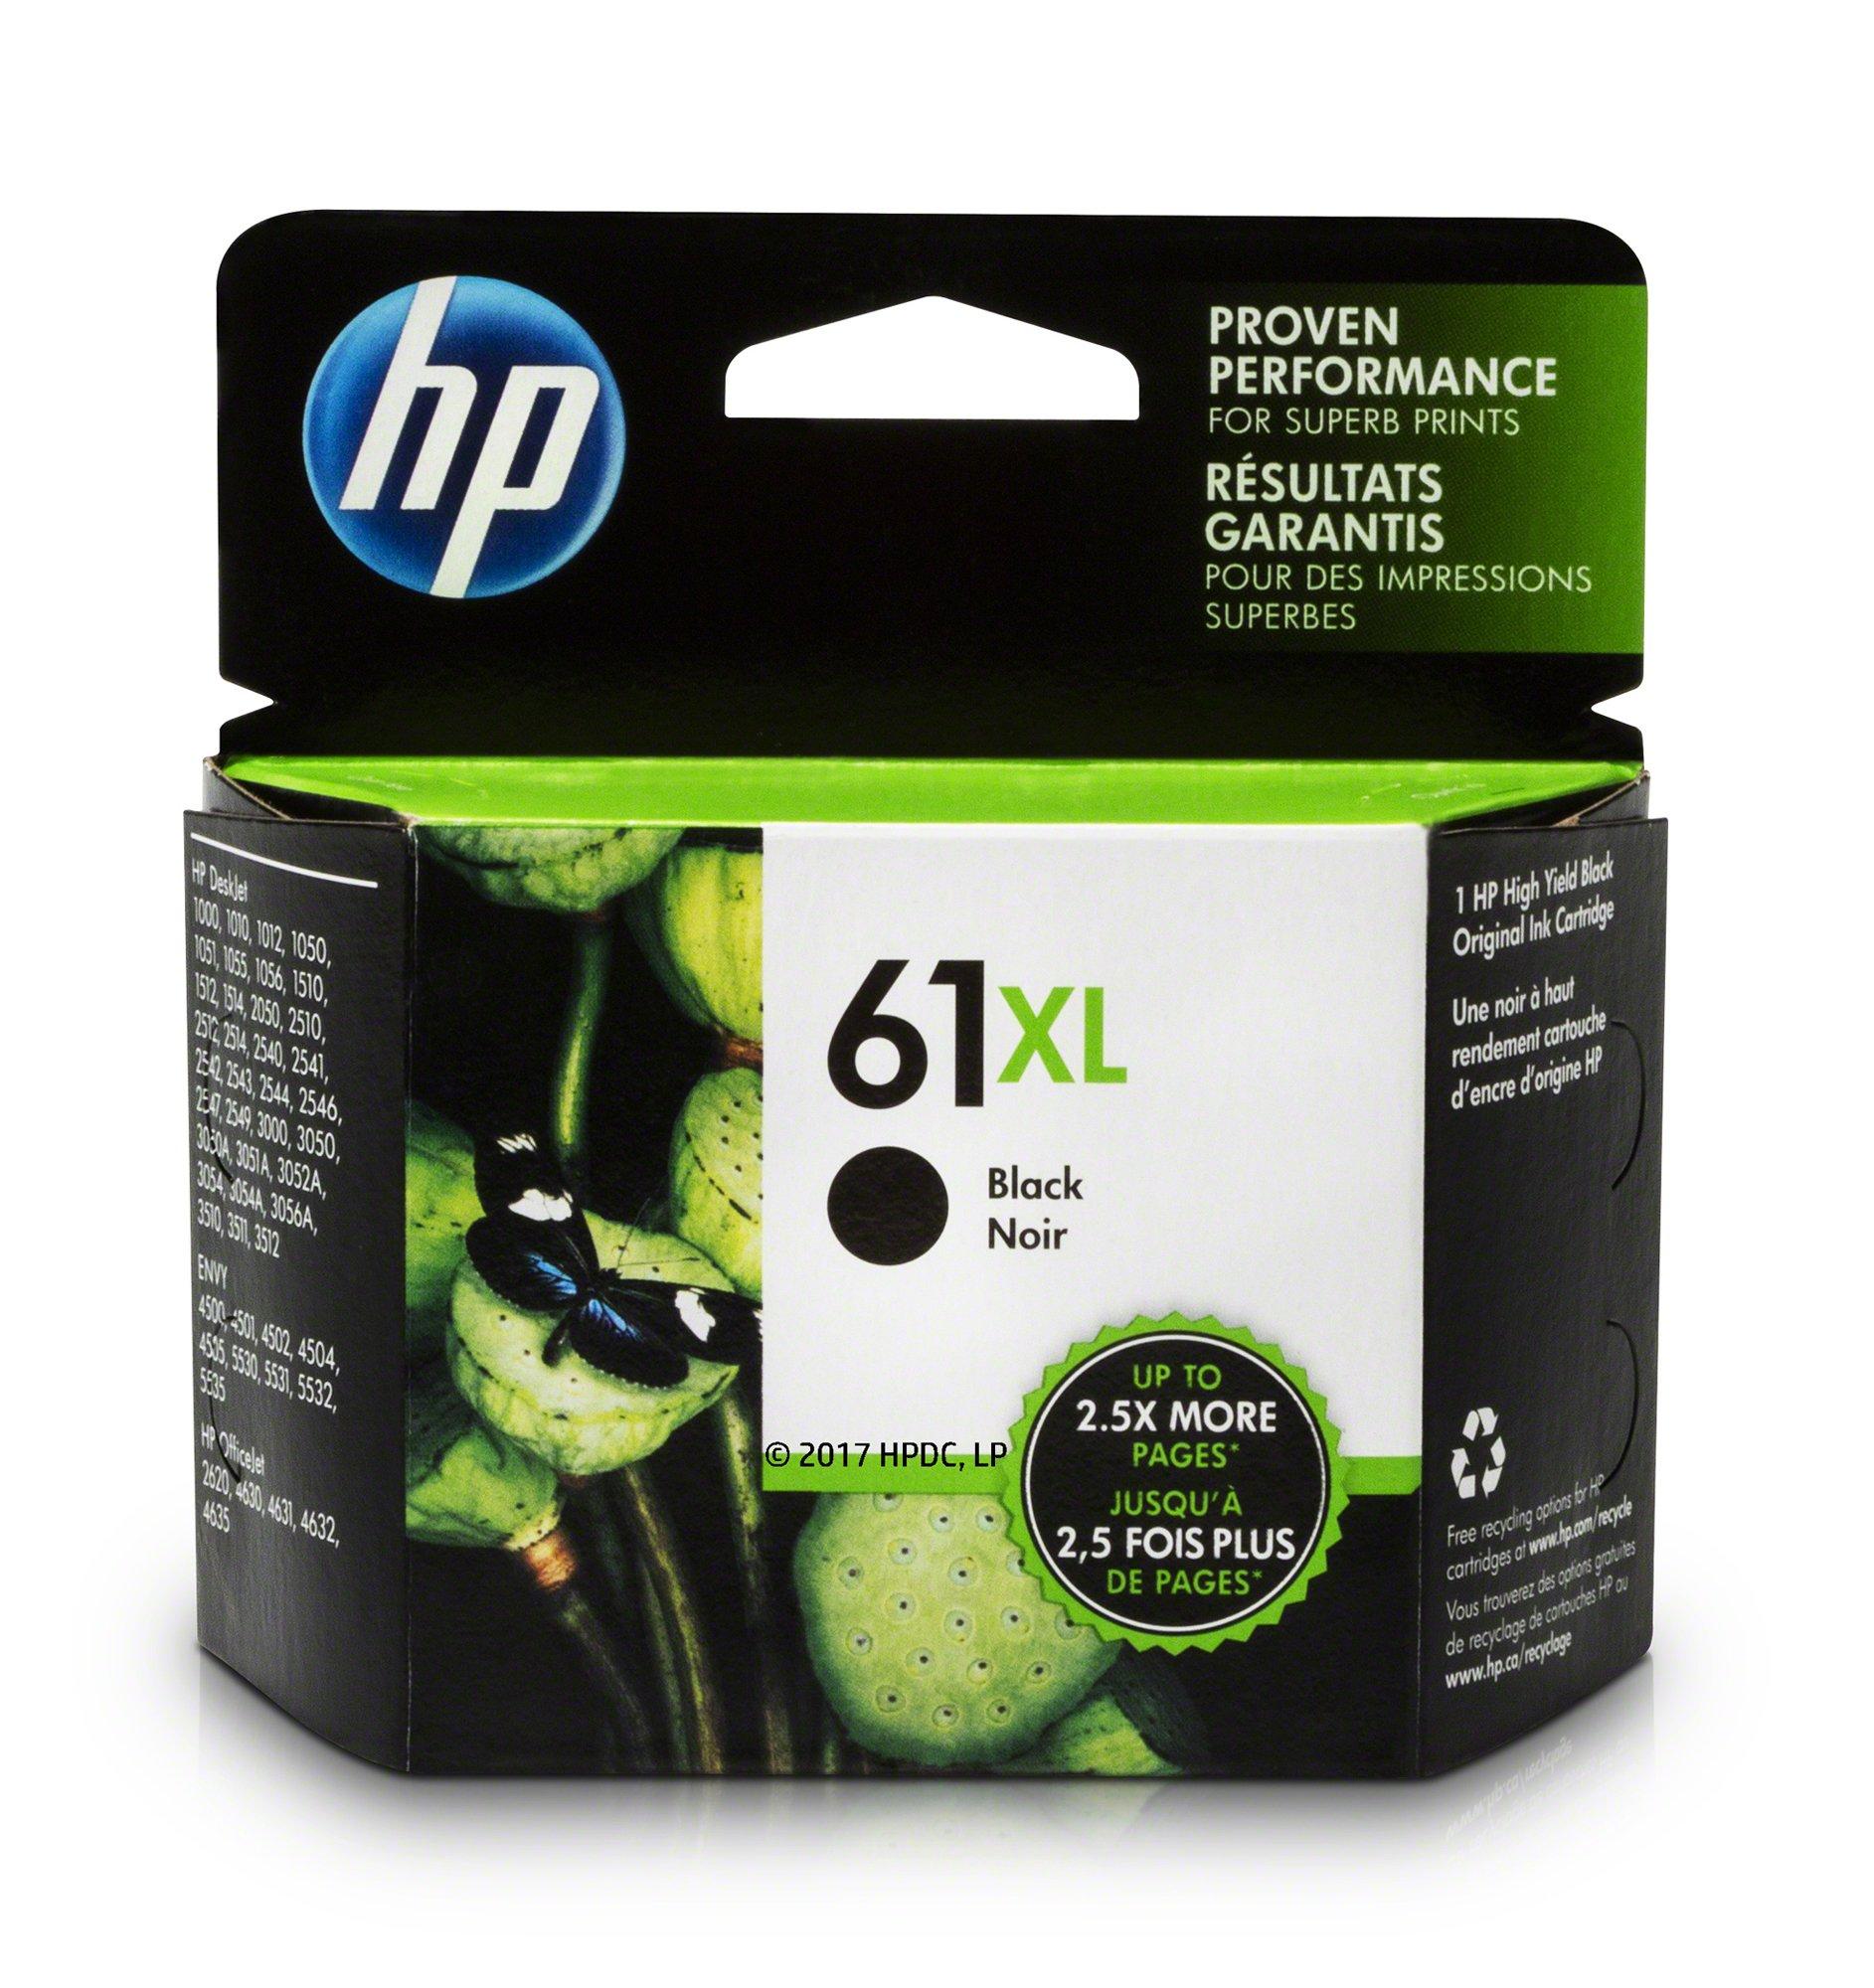 2X Black 2X Color Ink Compatible for HP 61 XL 61XL DeskJet 2510 2512 2514 2540